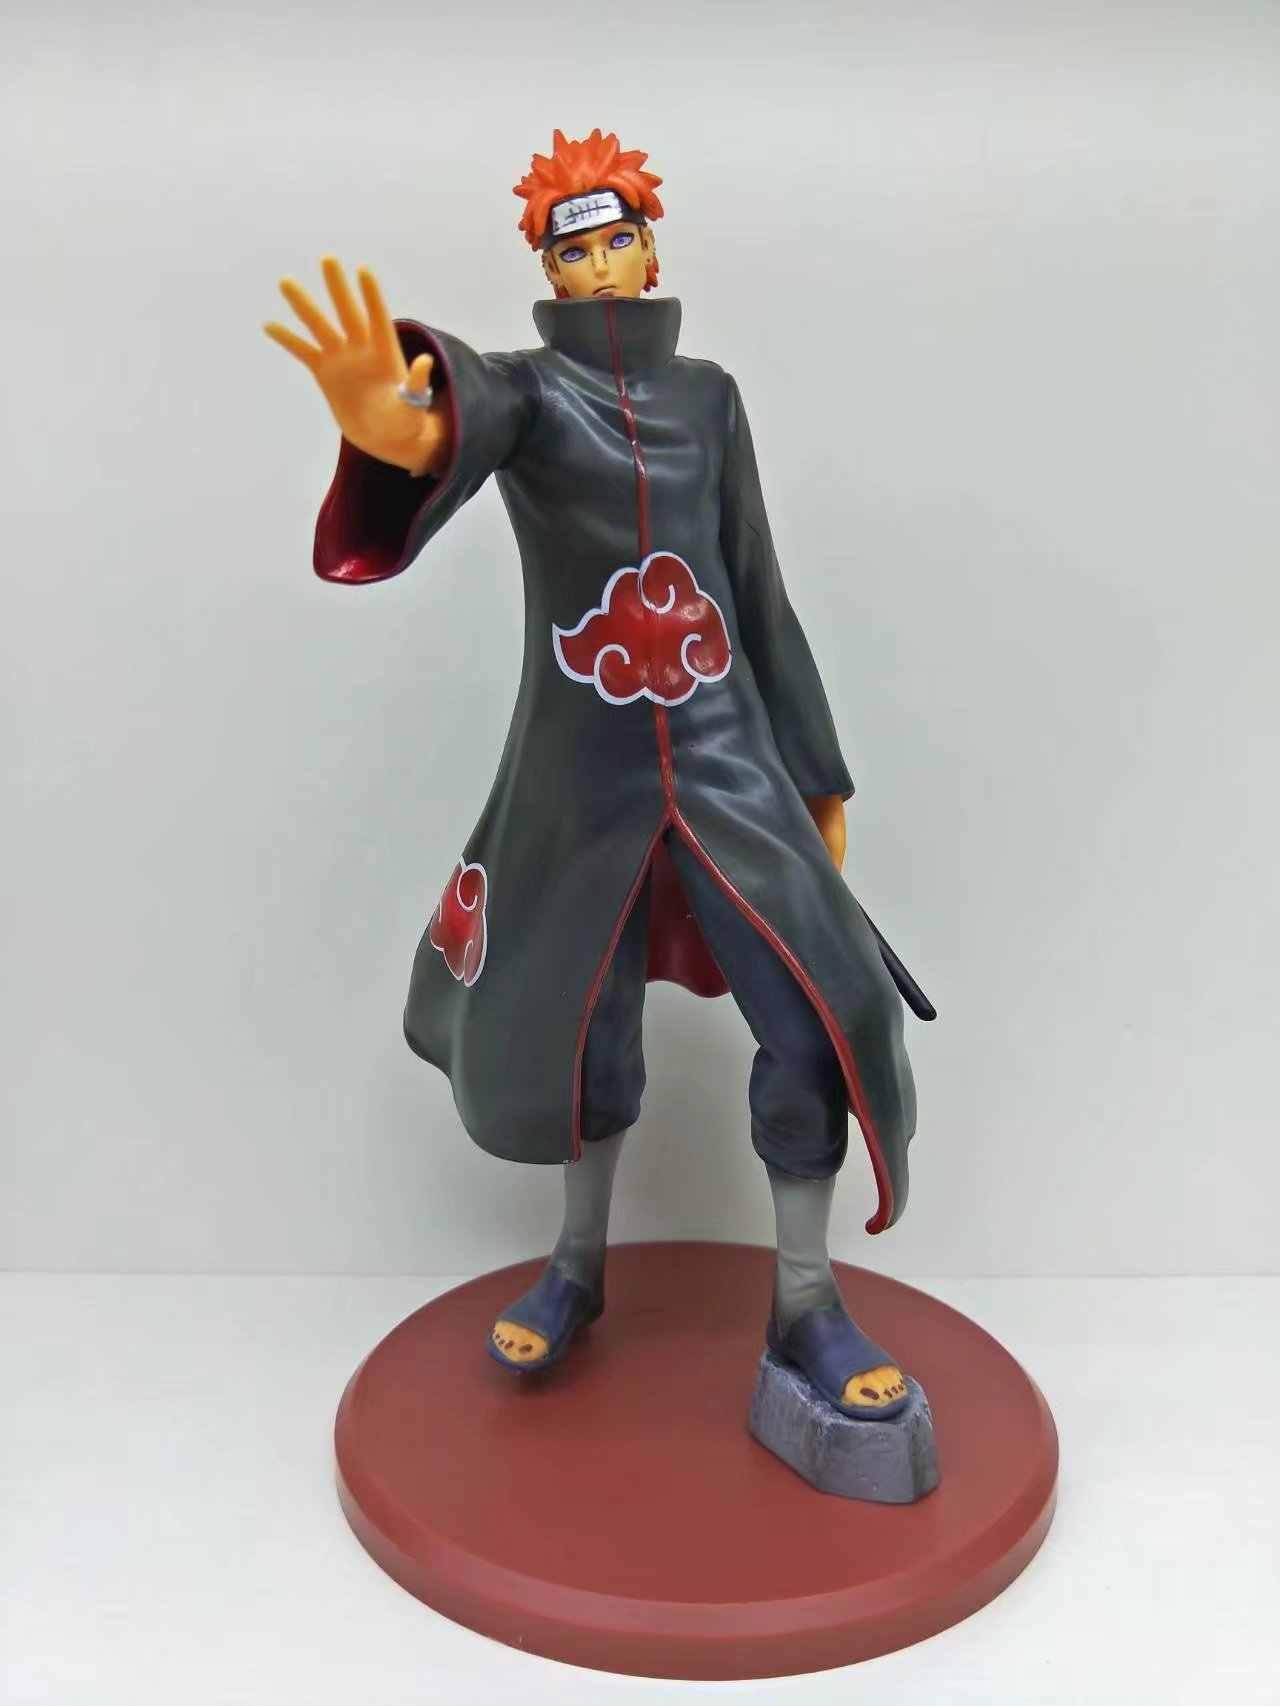 Naruto Shippuden Figure Toy Akatsuki Pain Yahiko Deva Path Anime  Collectible Model Doll Birthday Gift|